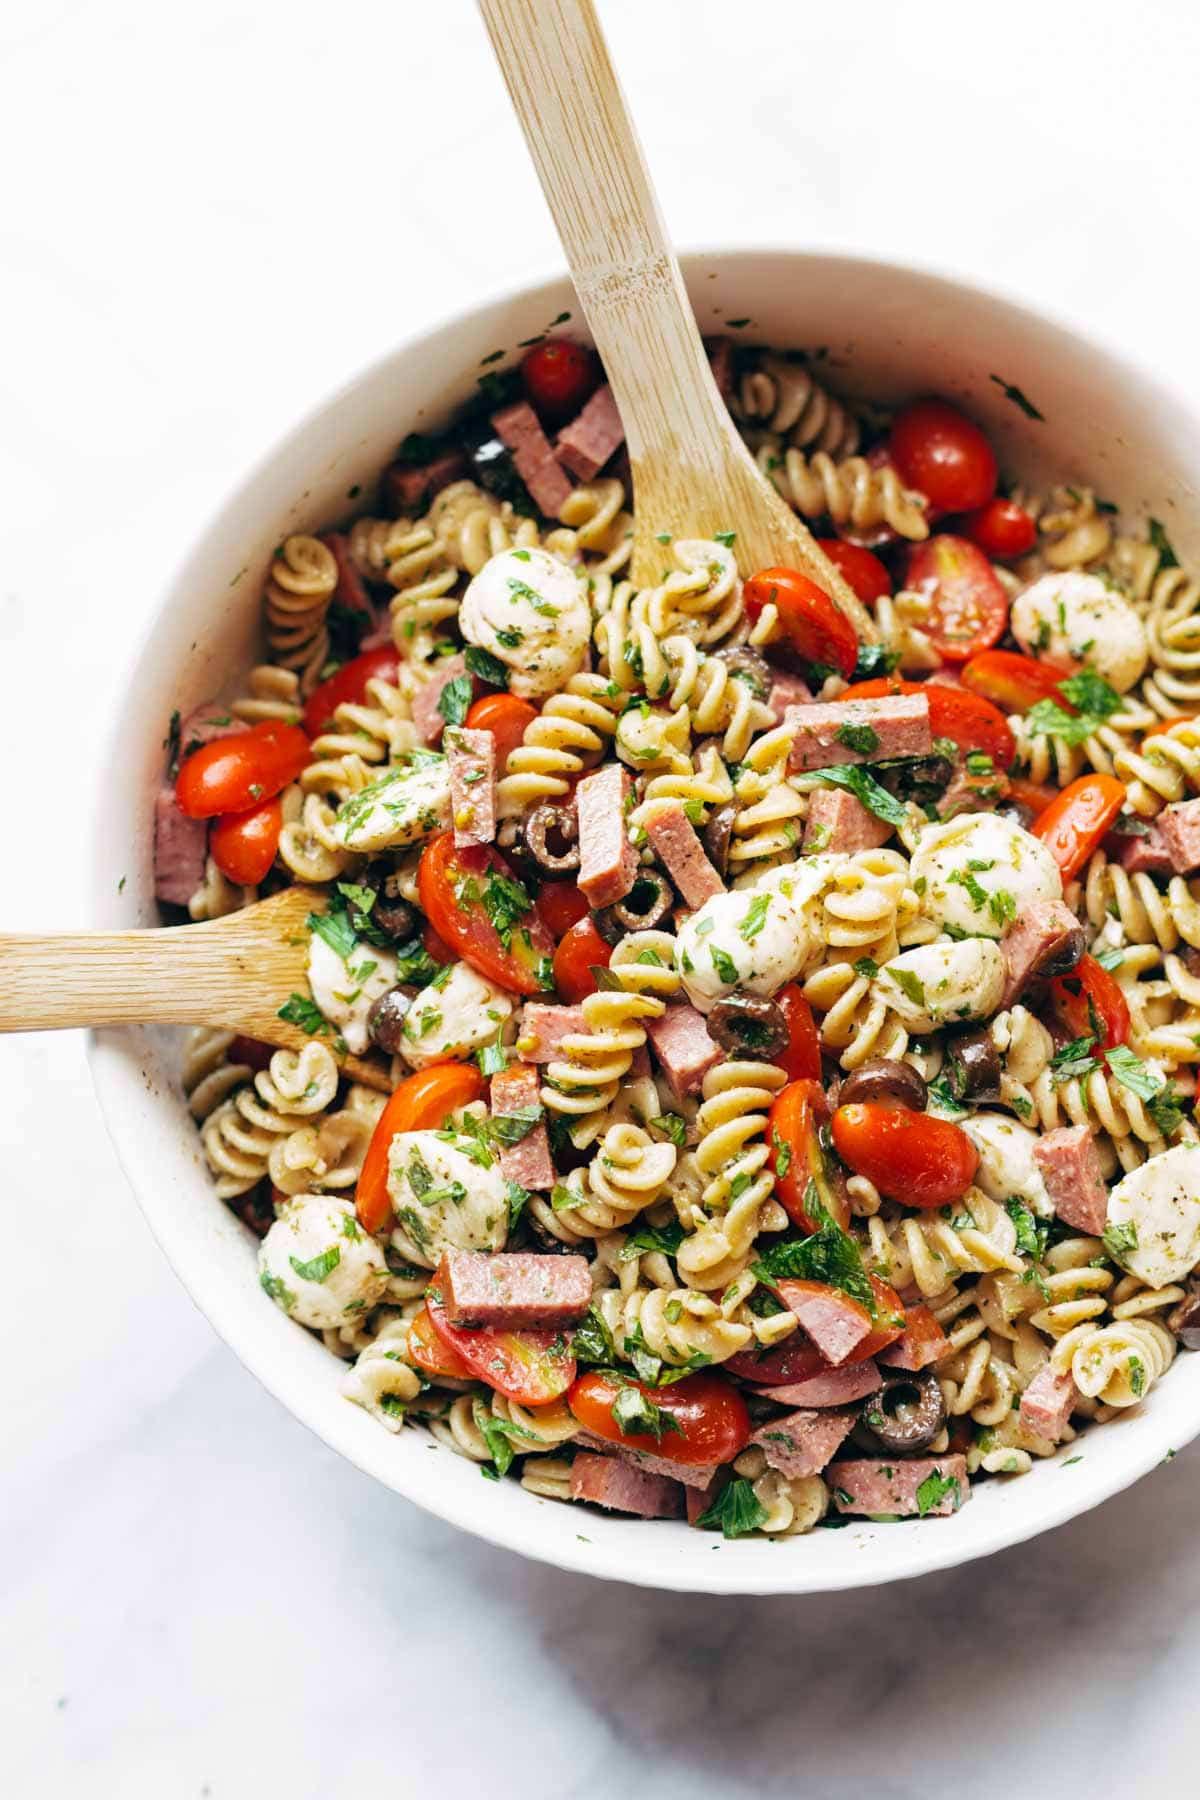 Easy Italian Pasta Salad  Best Easy Italian Pasta Salad Recipe Pinch of Yum